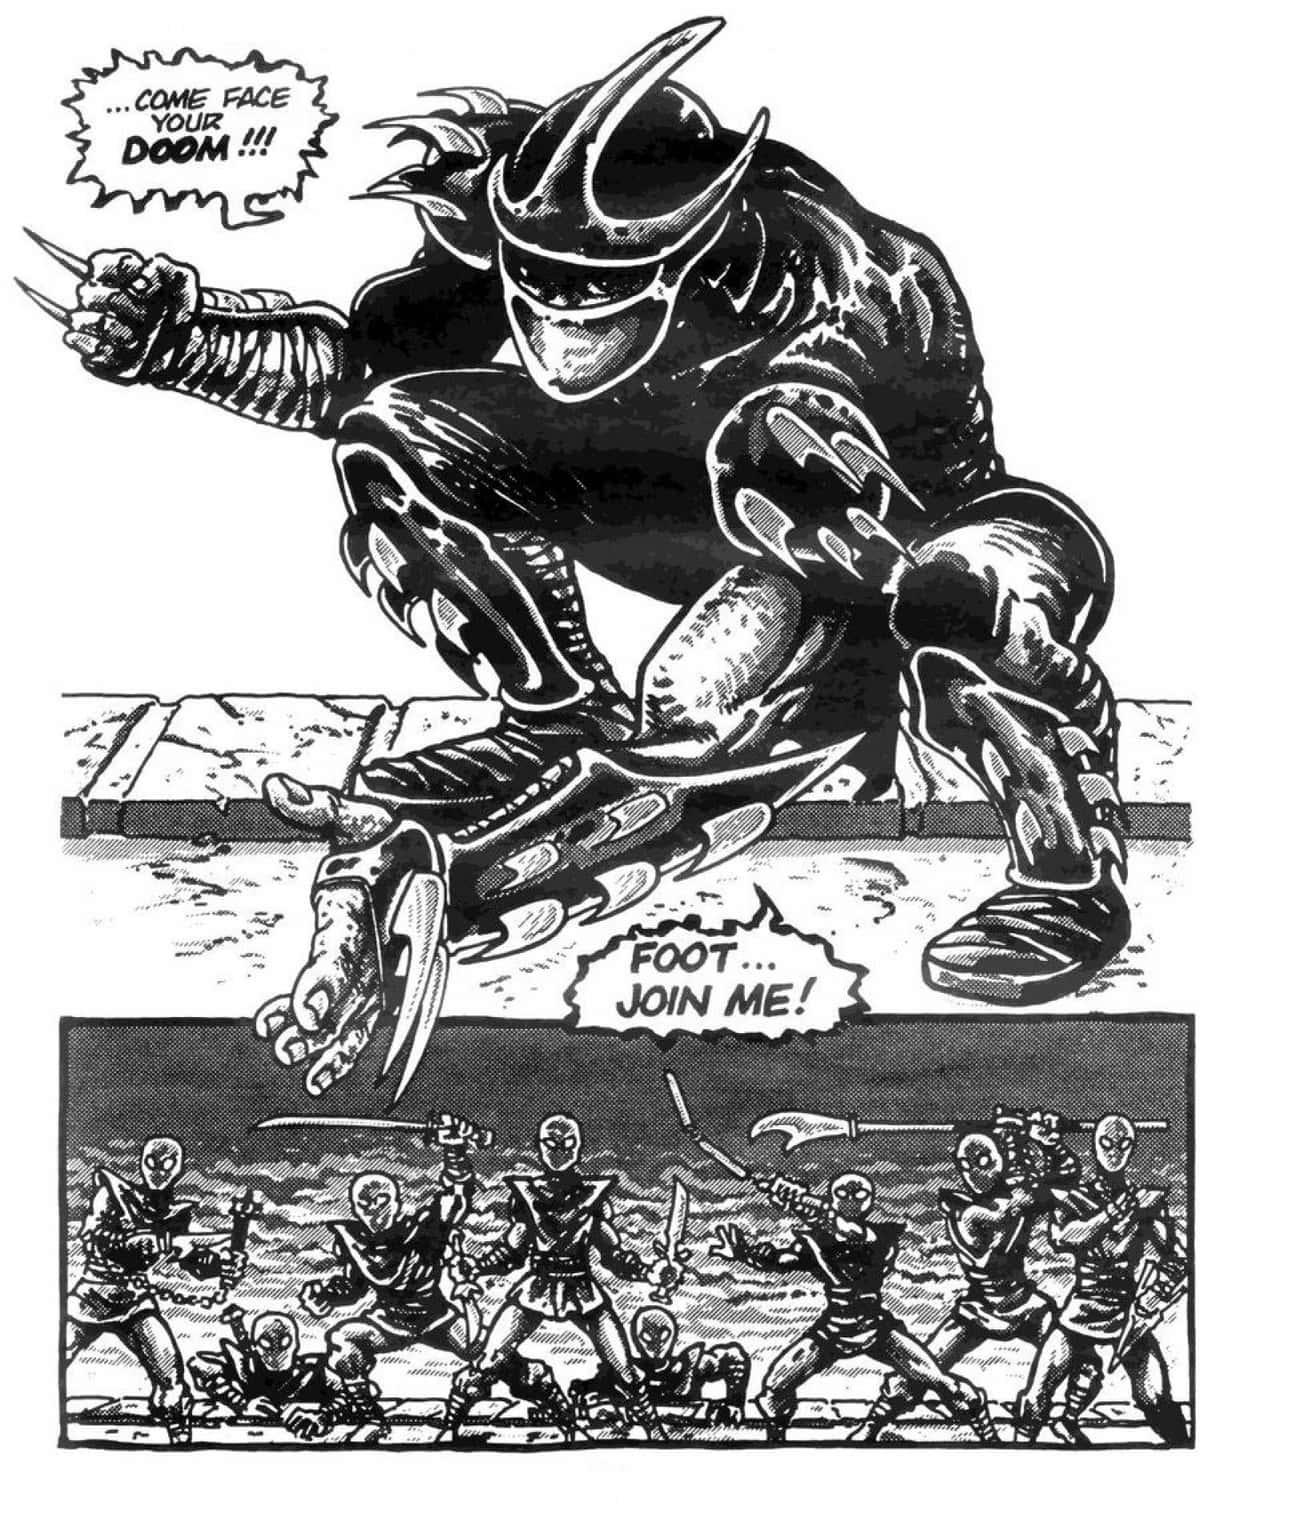 Shredder Is Originally A Drug  is listed (or ranked) 2 on the list Before The Cartoons, The Teenage Mutant Ninja Turtles Used To Just Straight-Up Murder People